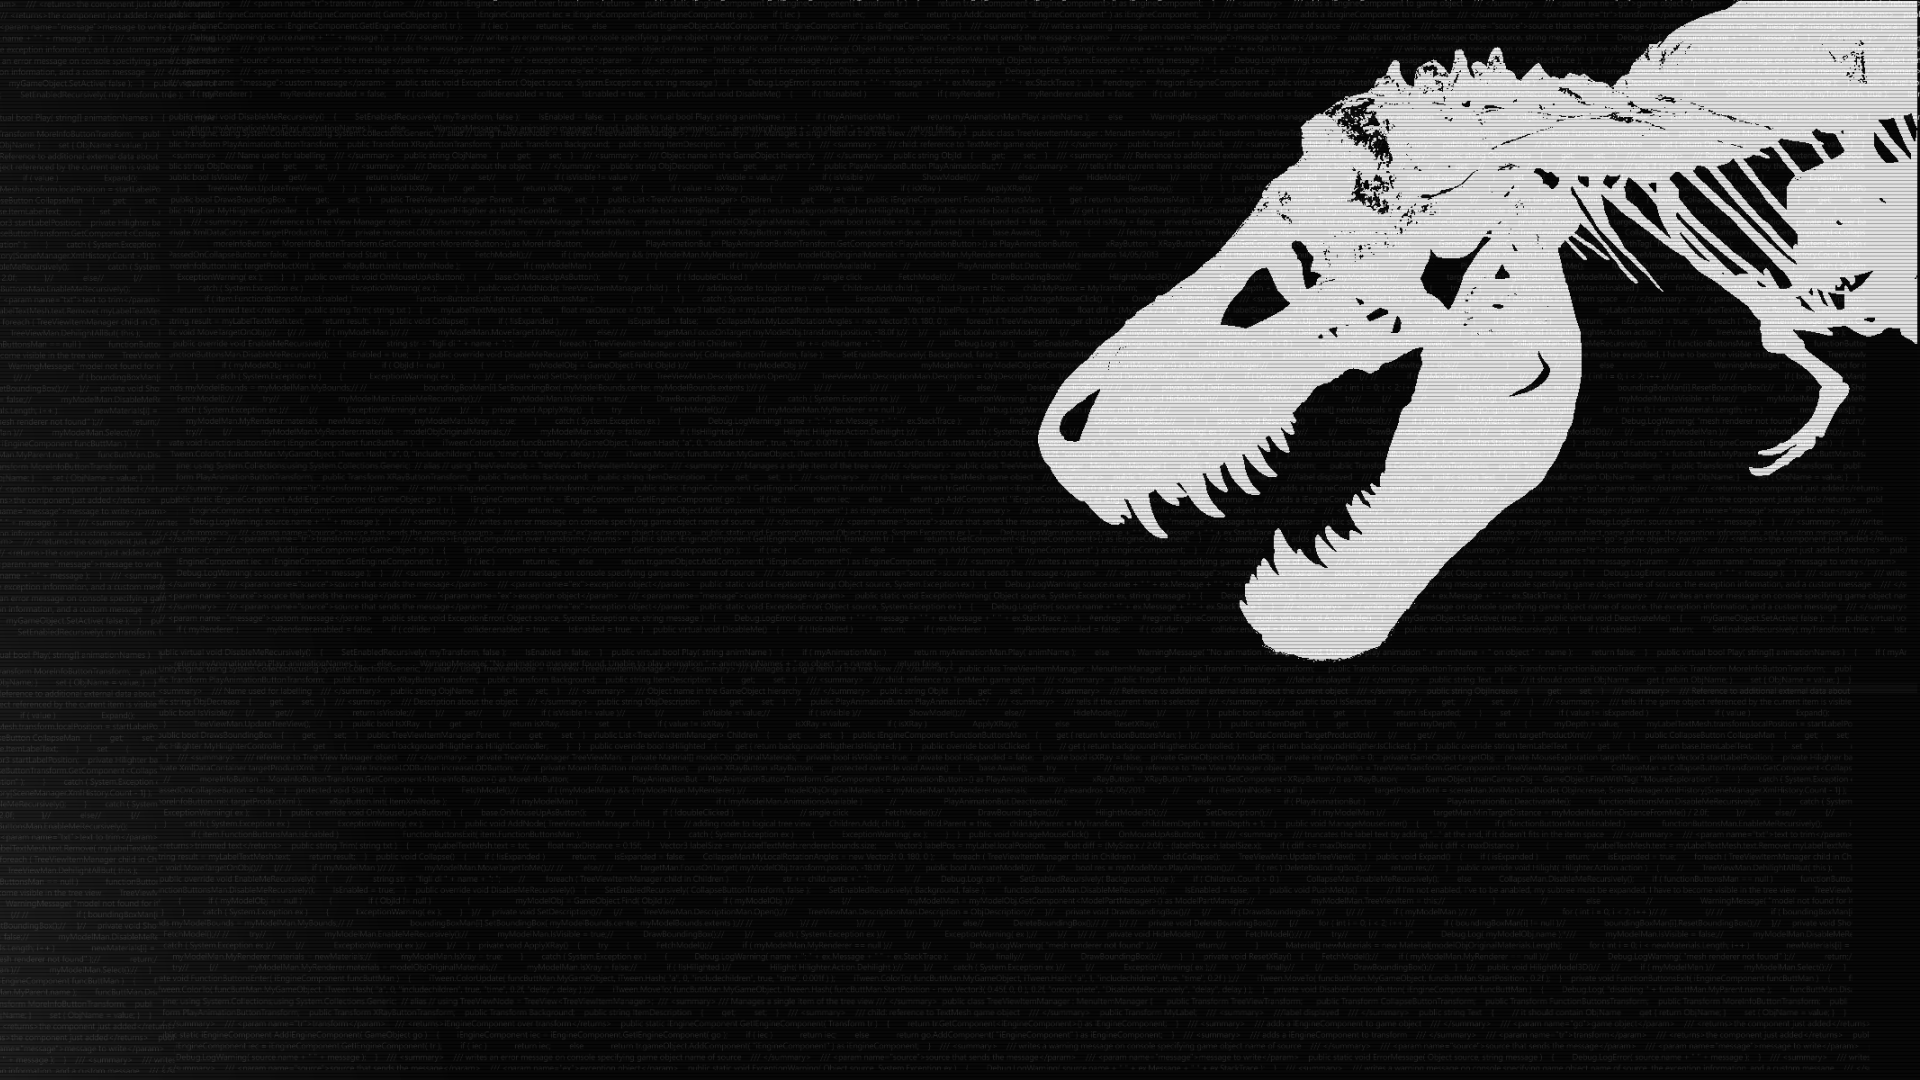 T Rex Wallpapers  Full HD wallpaper search